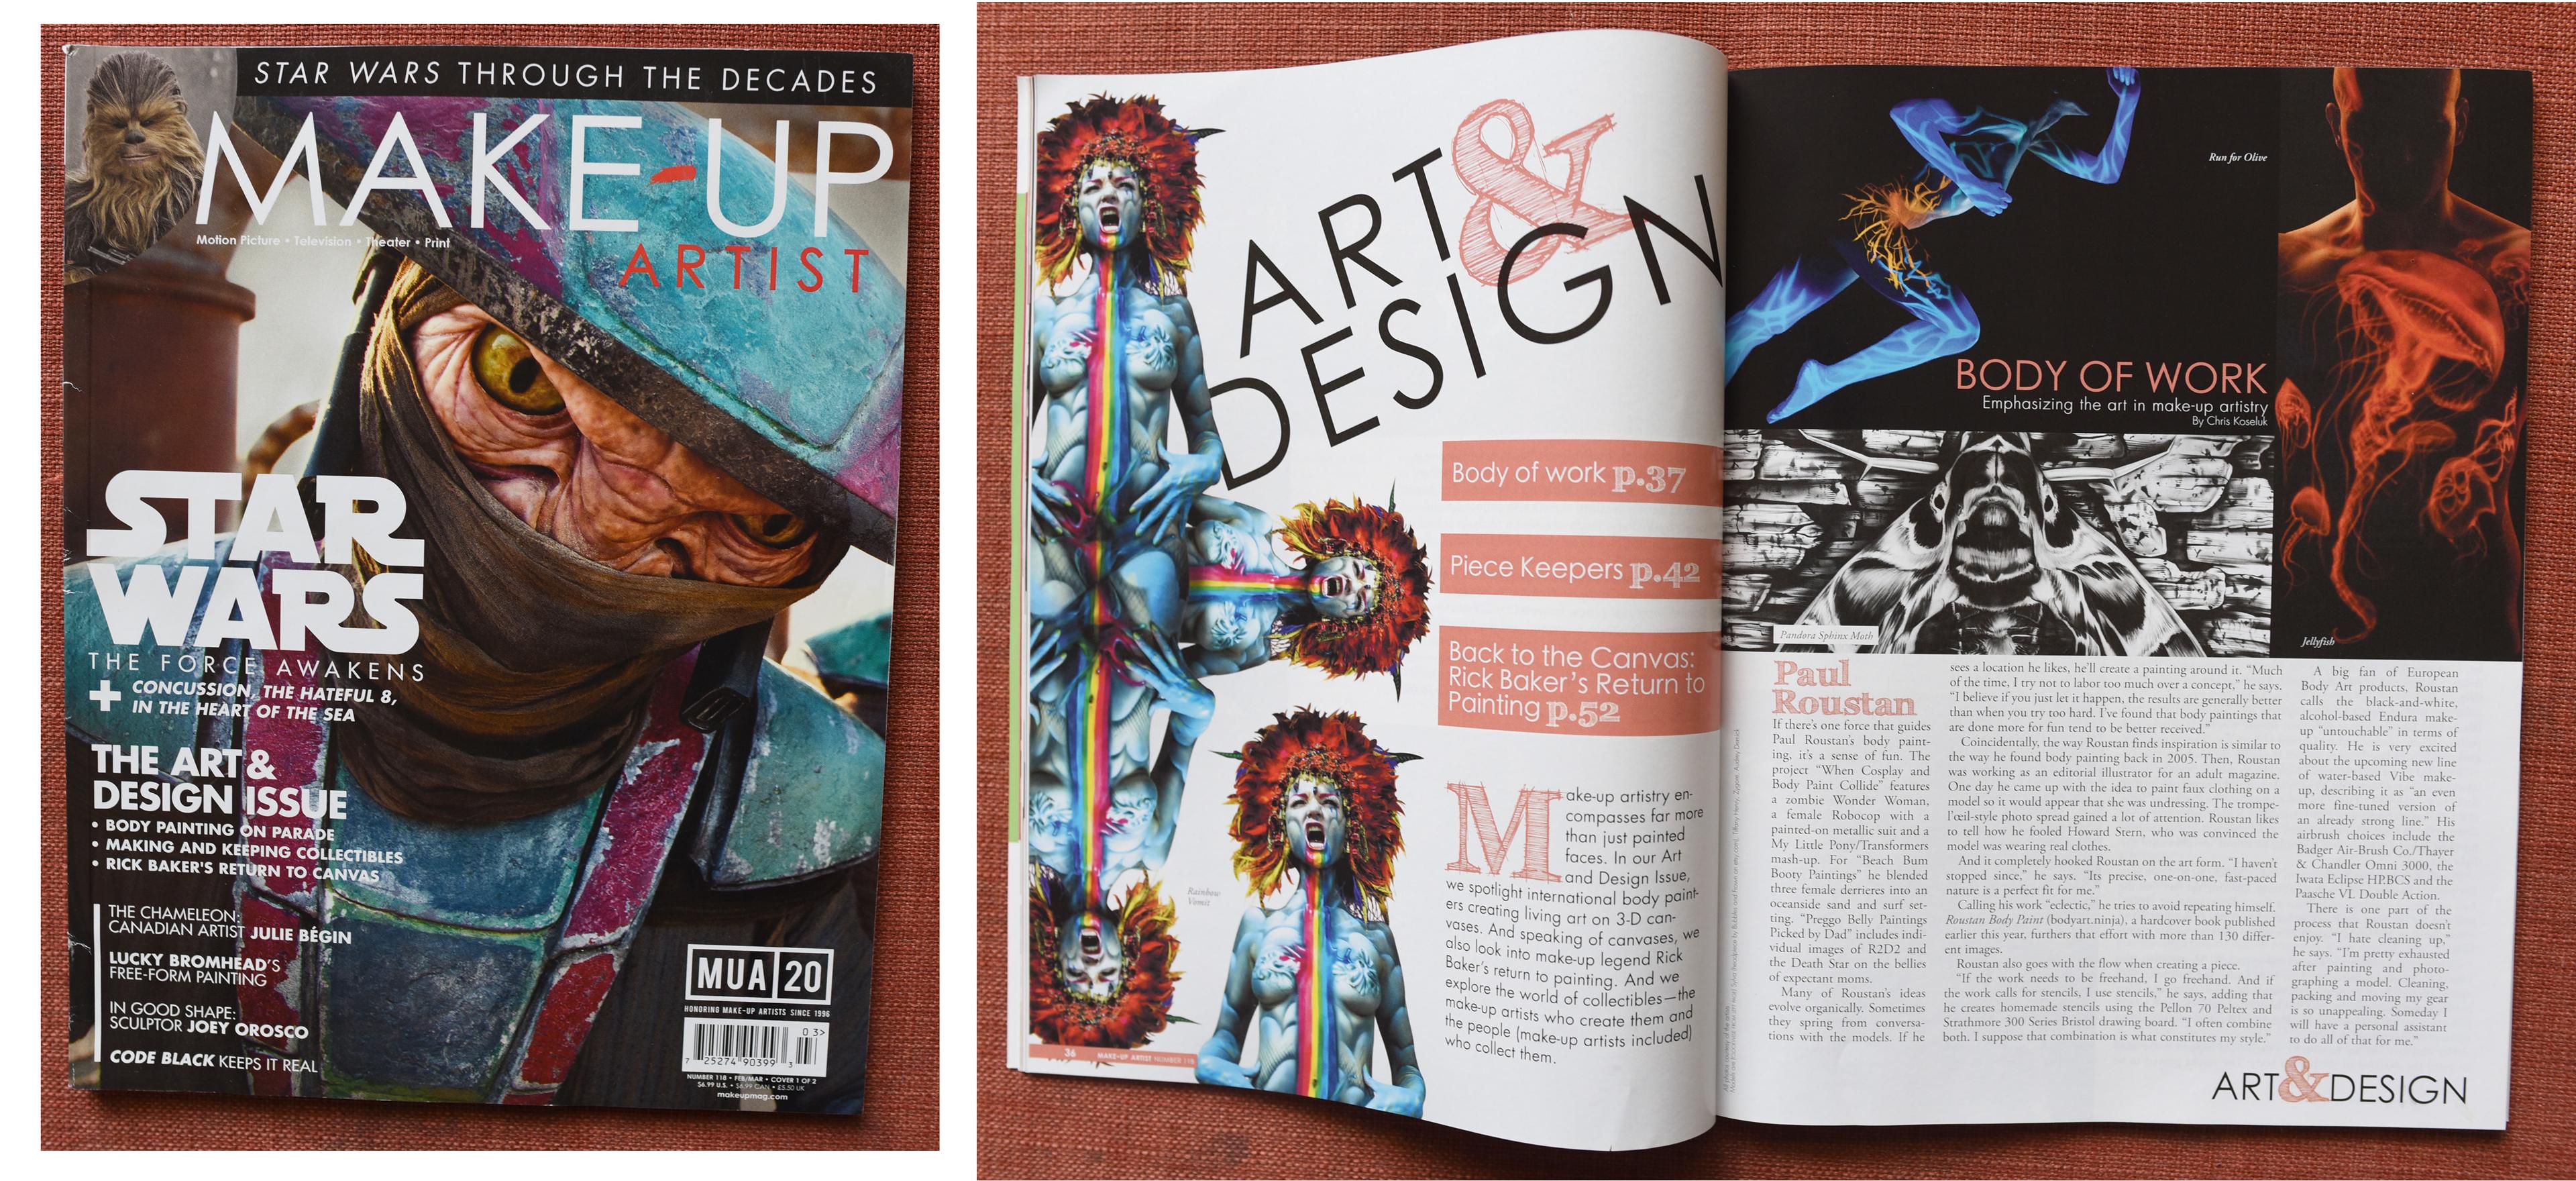 Paul Roustan featured in Makeup artist magazine